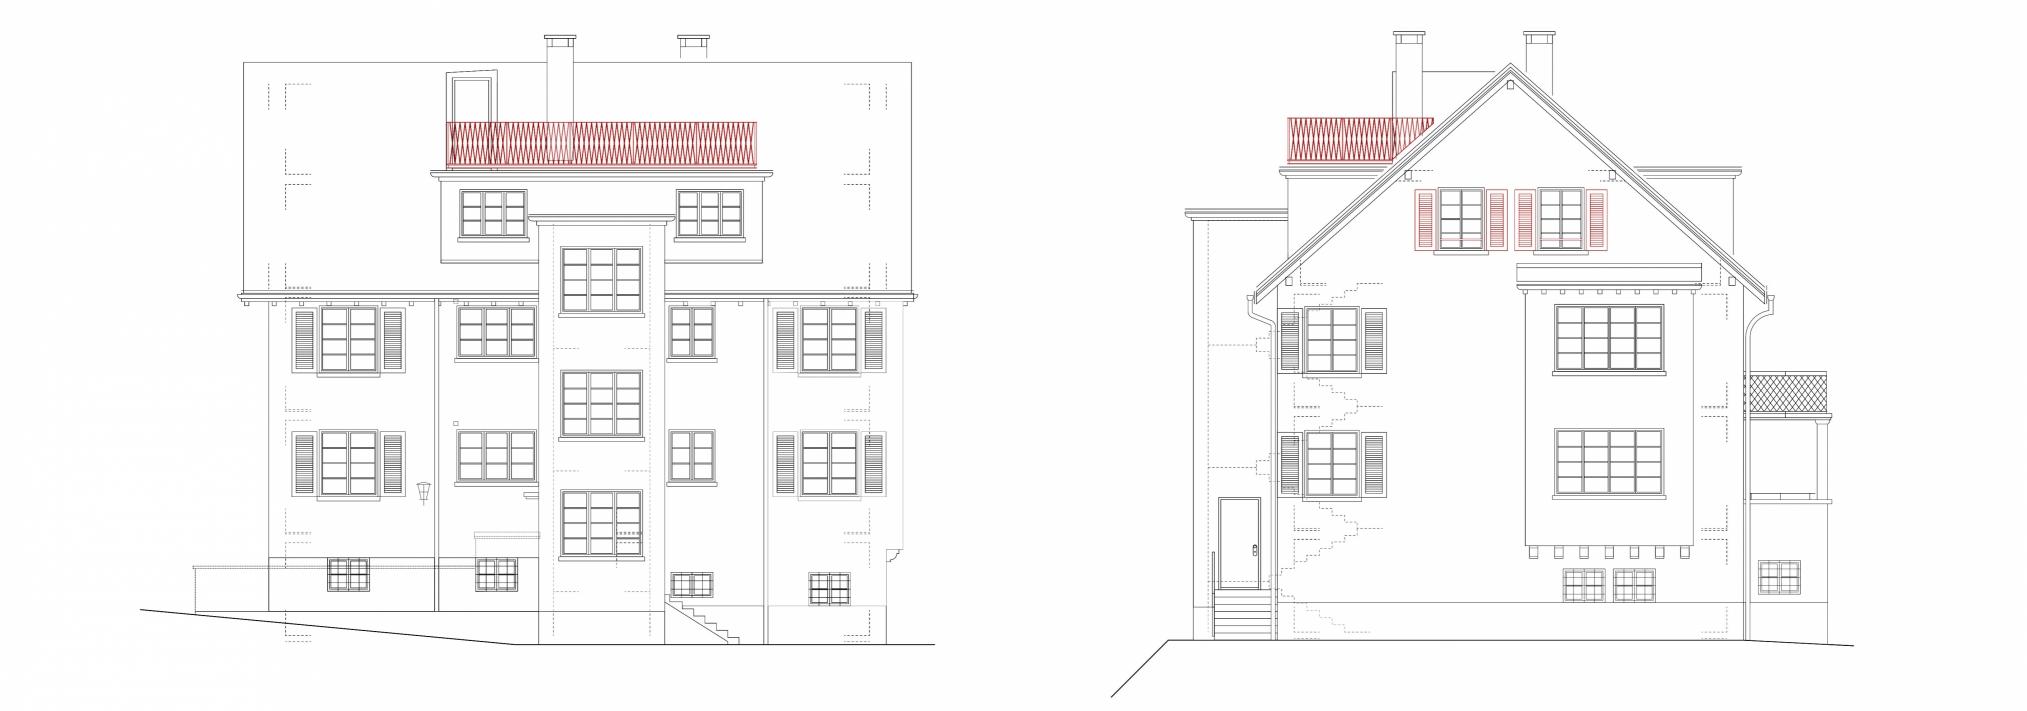 MAARCH_Murer_André_Umbau-Bramberg-Fassade_100_web.jpg